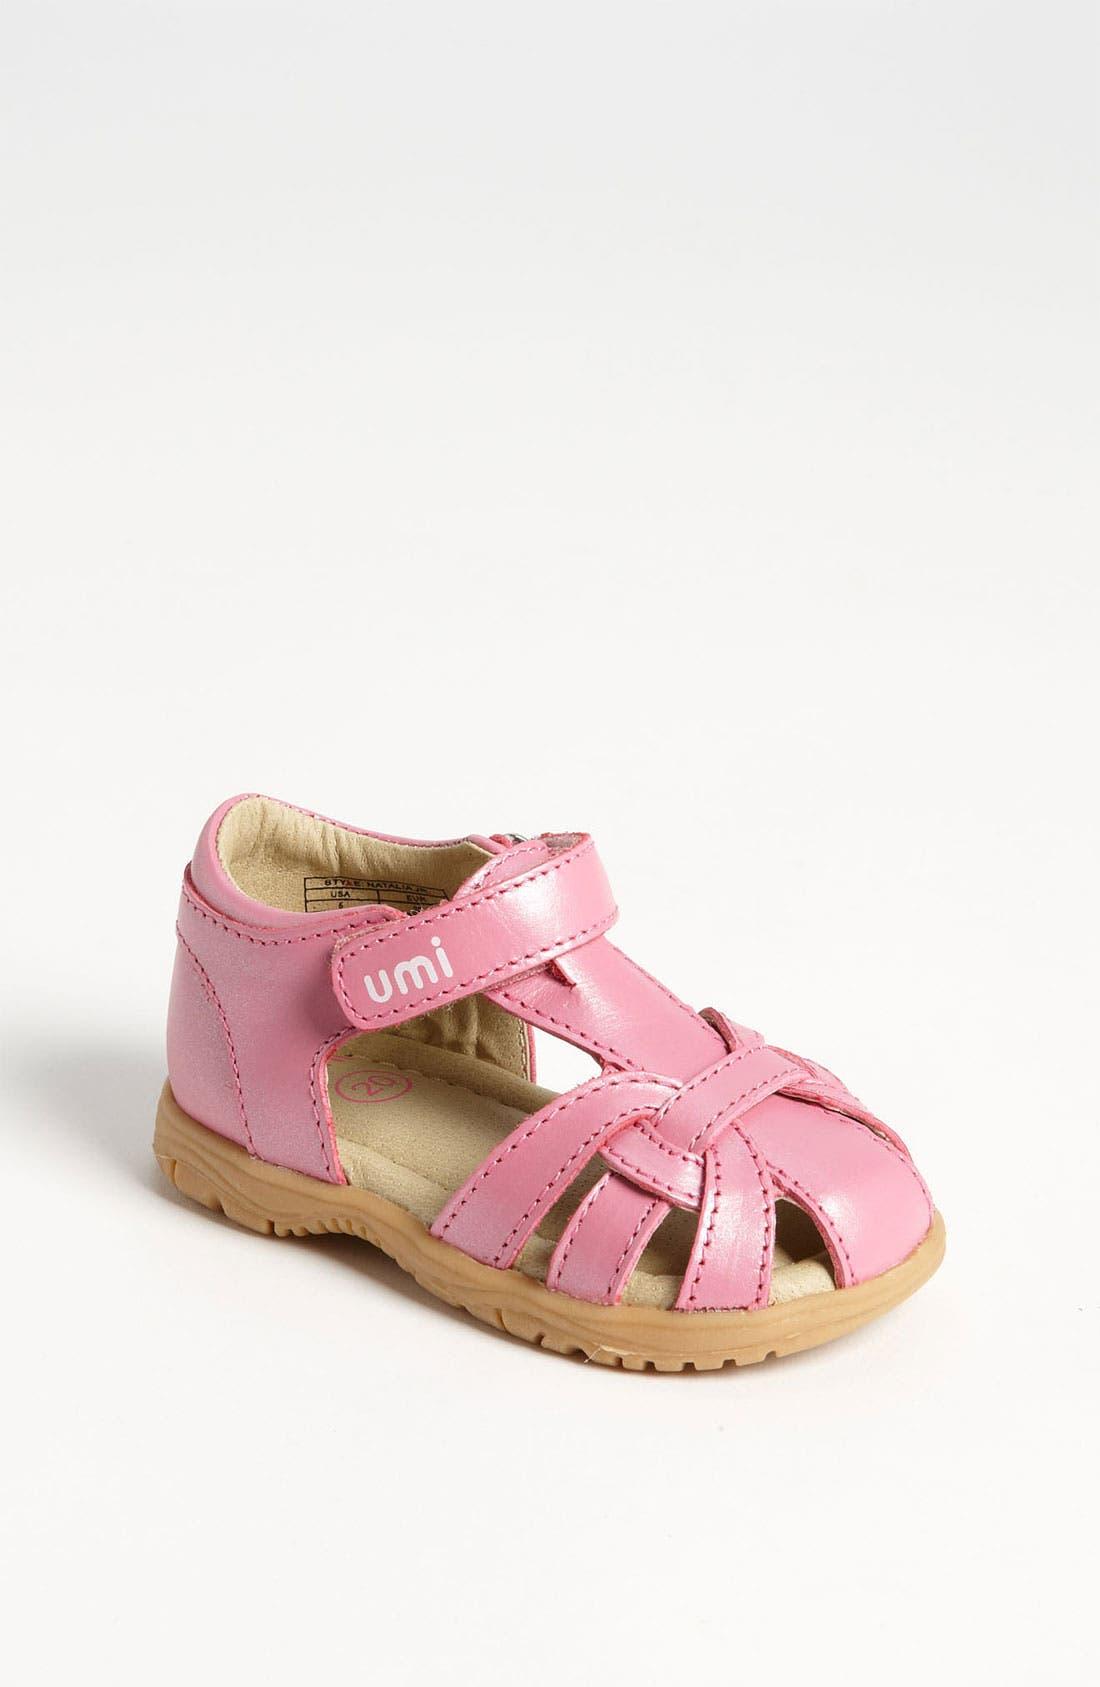 Main Image - Umi 'Natalia' Sandal (Baby, Walker & Toddler)